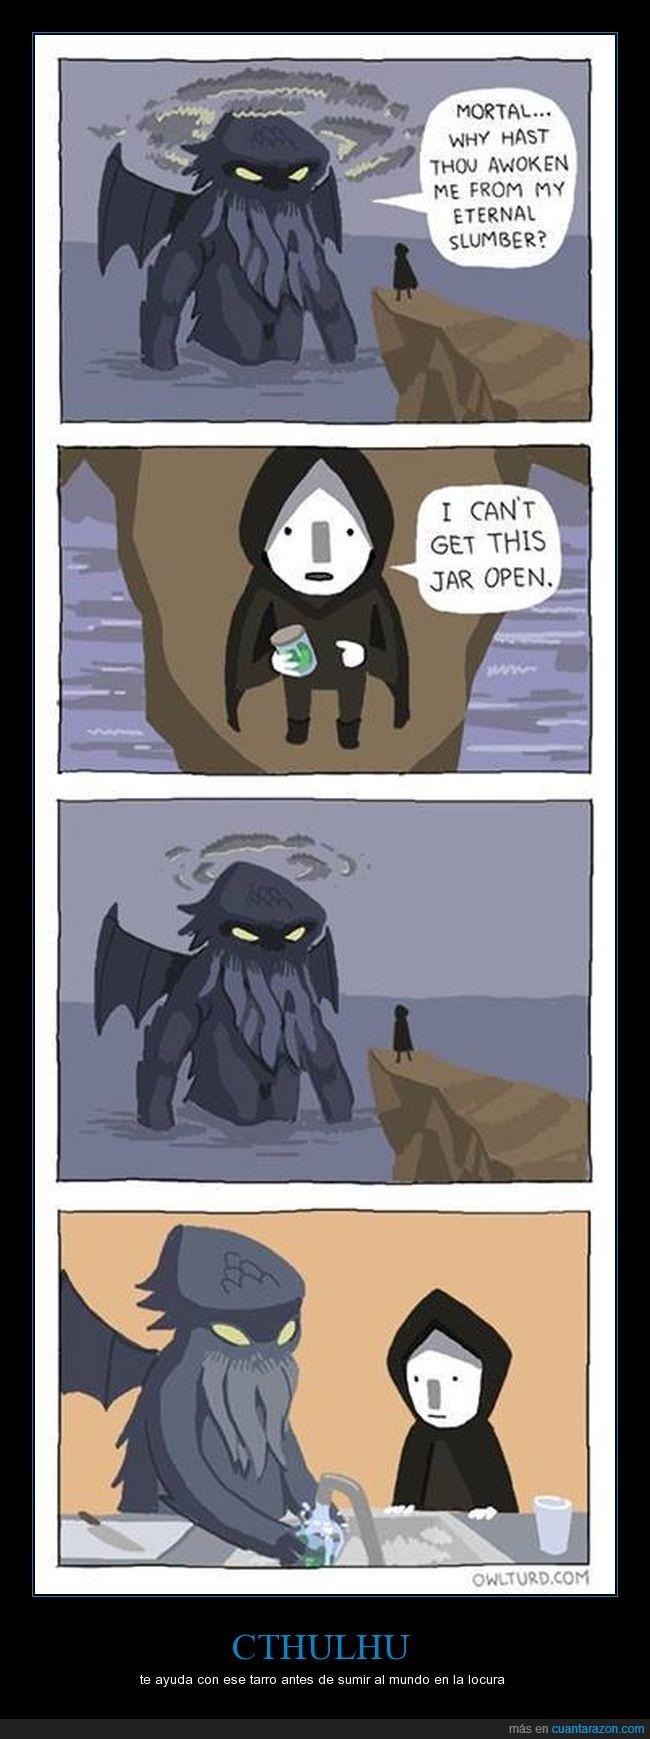 abrir,ayudar,cthulhu,dioses primordiales,H.P. Lovecraft,tarro